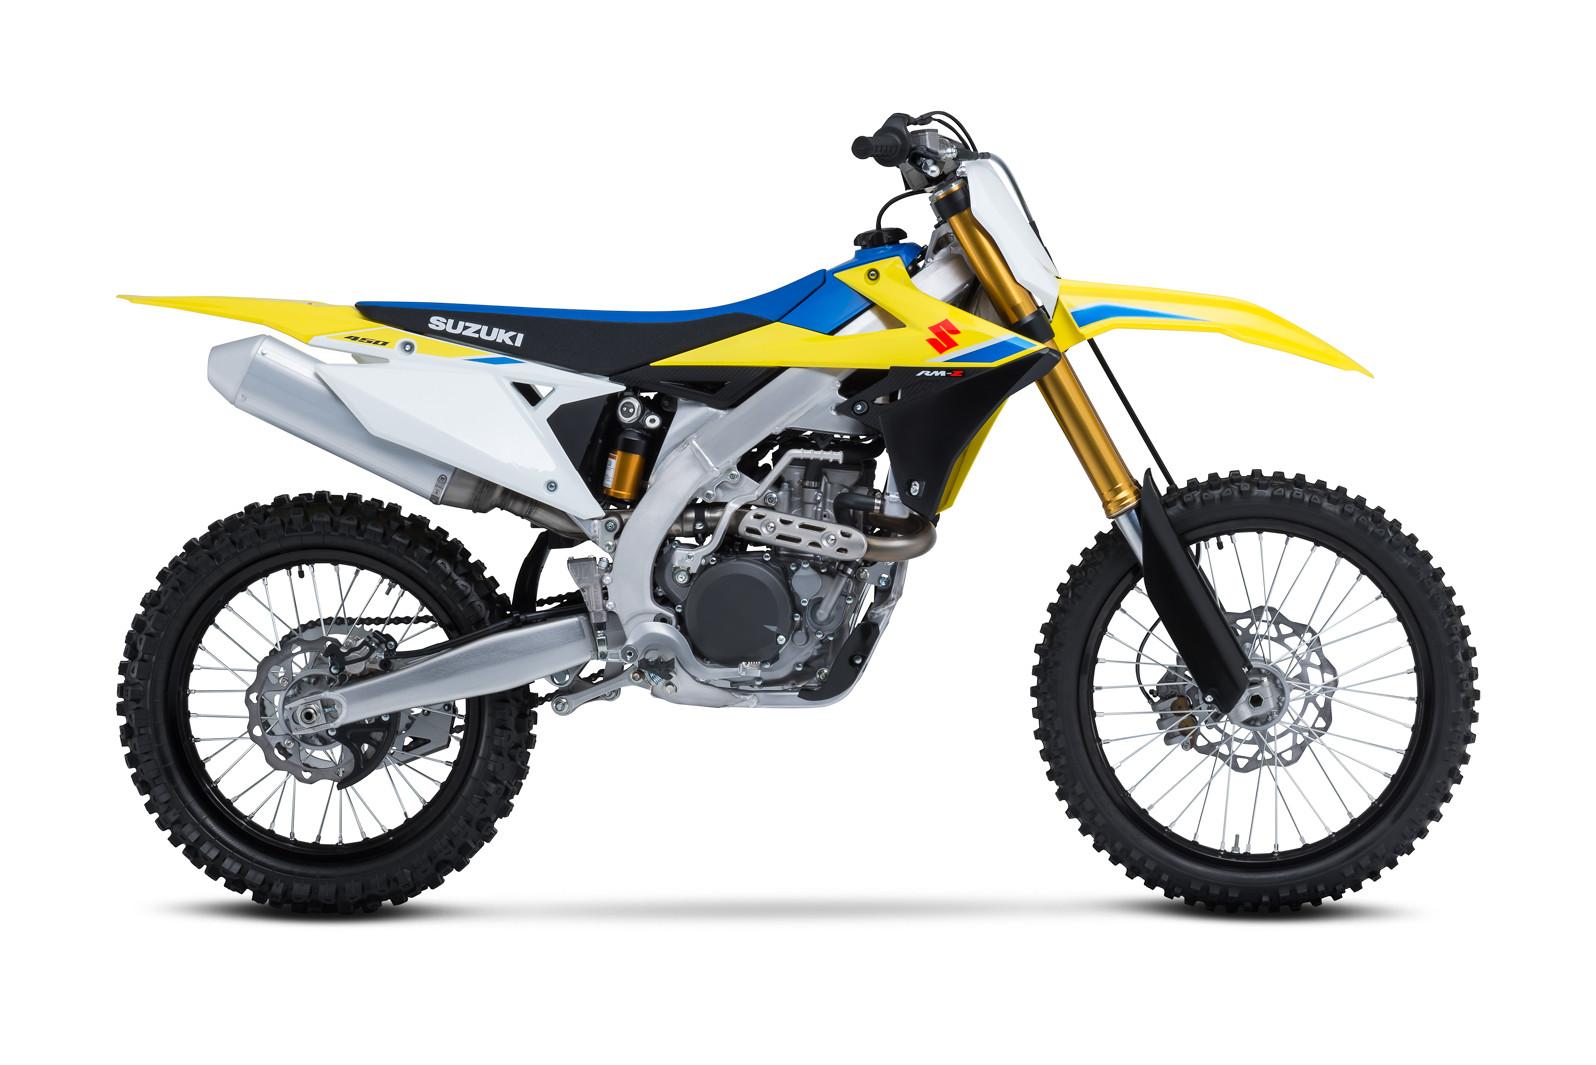 2018 Suzuki Rm Z450 Reviews Comparisons Specs